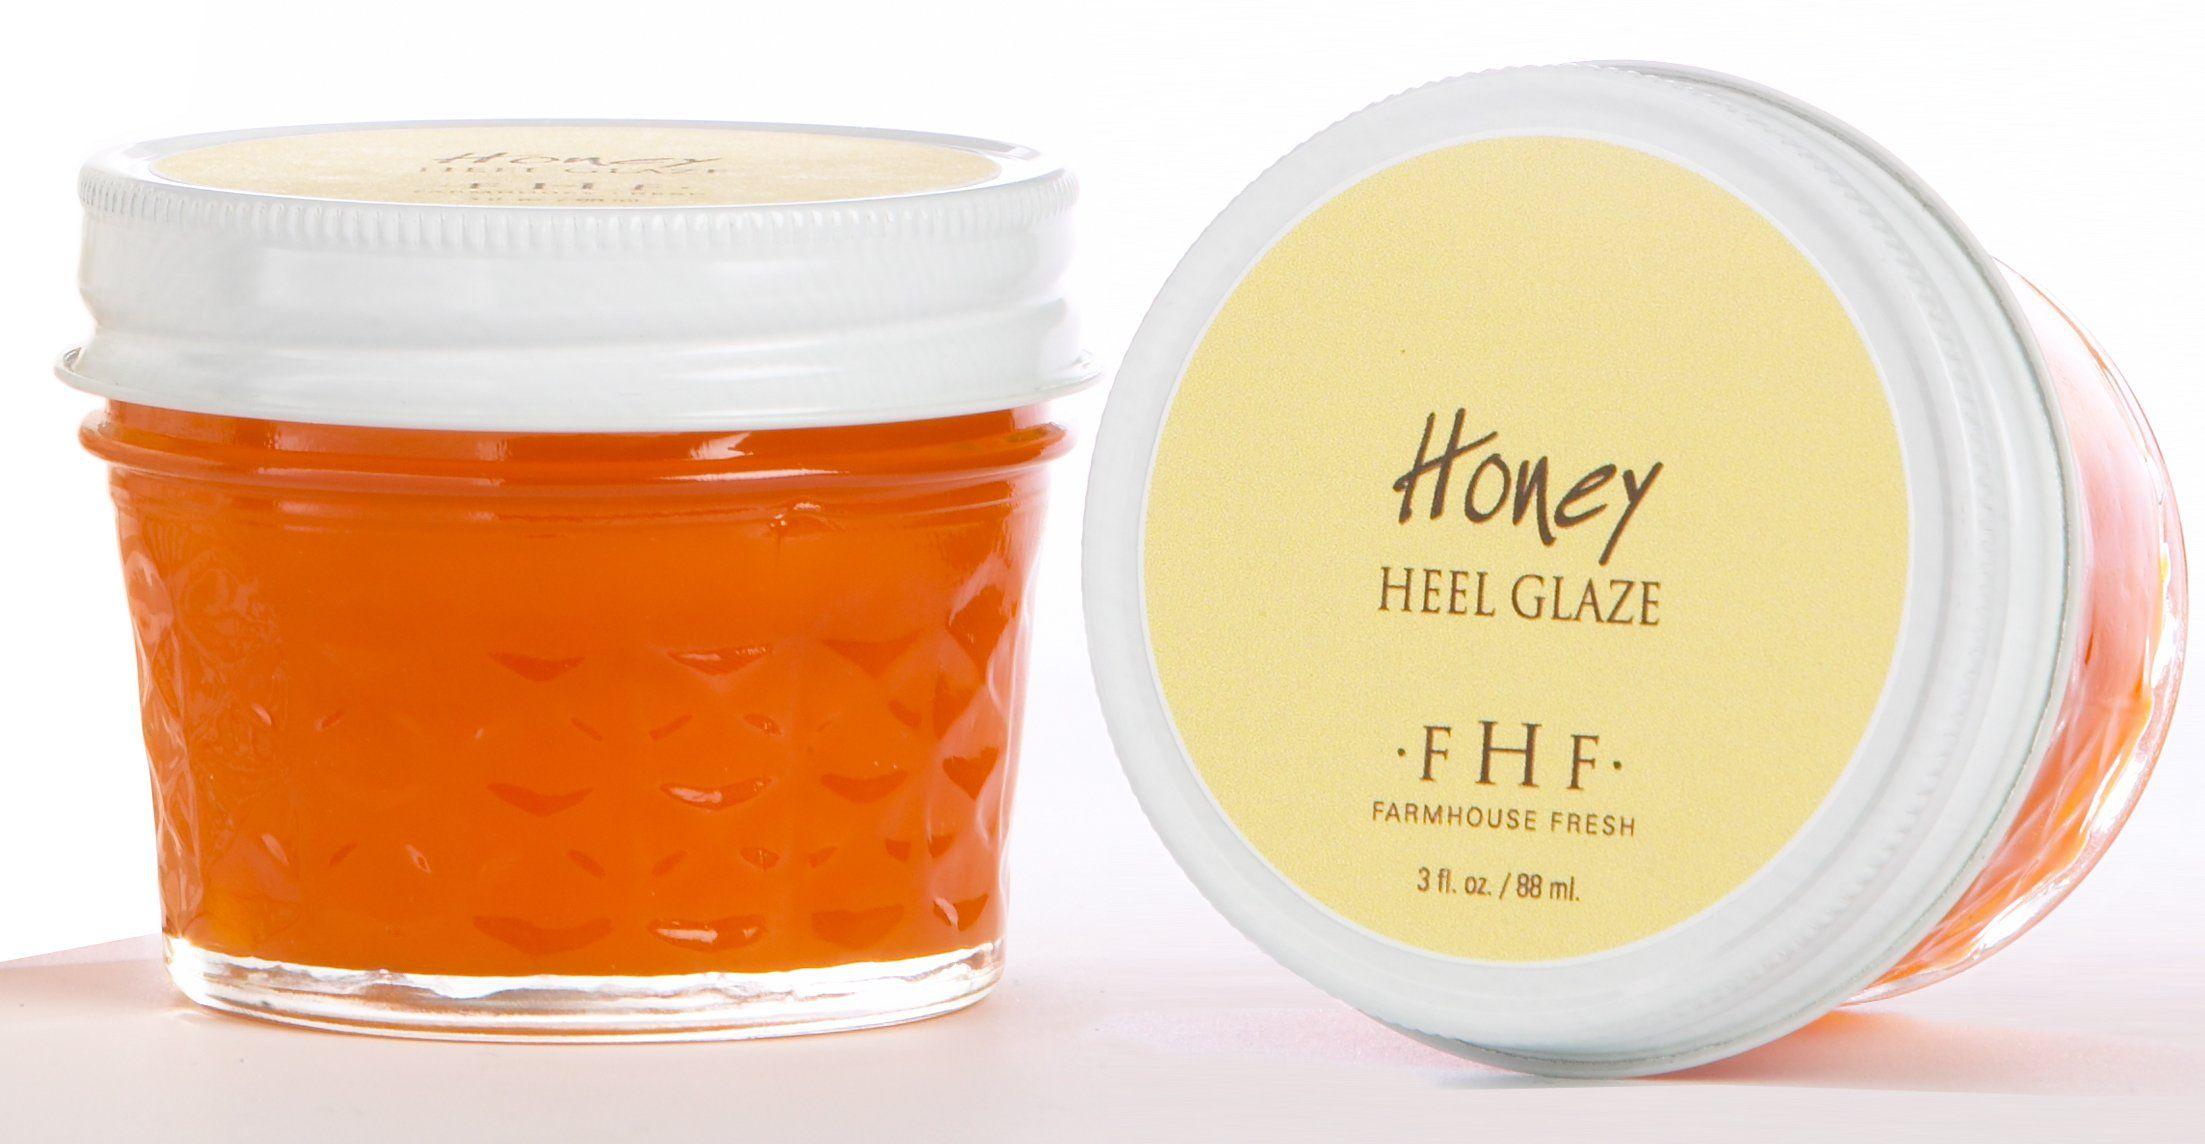 Fhf honey heel glaze 3oz skin care moisturizer fresh